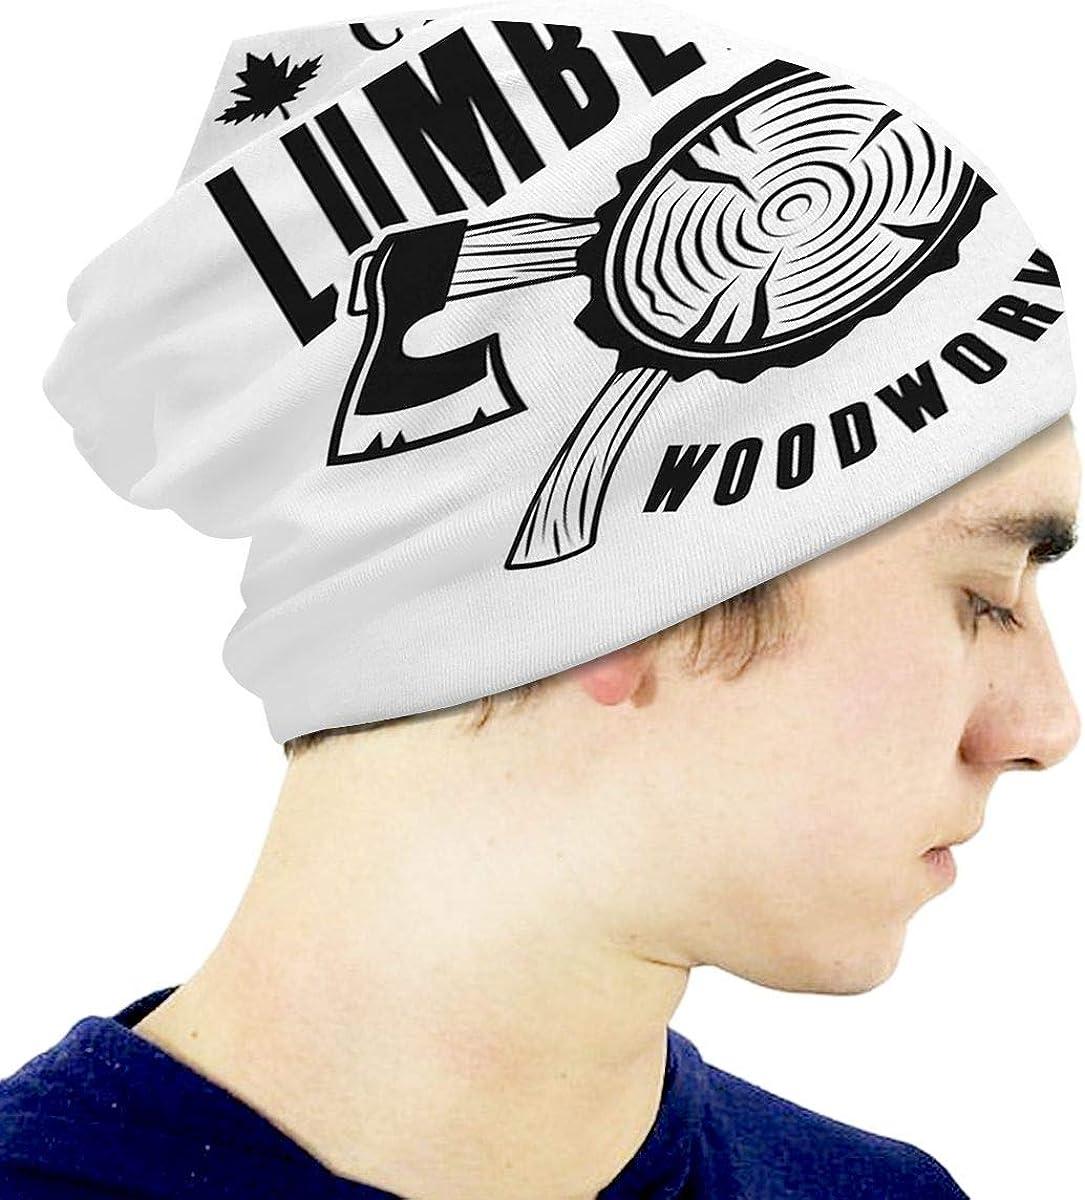 Novelty More Slouchy Beanie Hat Woodworks Lumberjack Emblem Two Crossed Axes Front View Woode Clothing Shoes Jewelry Avmc Edu In See more fan art related to #dangan ronpa , #kirumi tojo , #tenko chabashira , #kokichi ouma , #shuuichi saihara , #kaito momota , #birthday. avmc